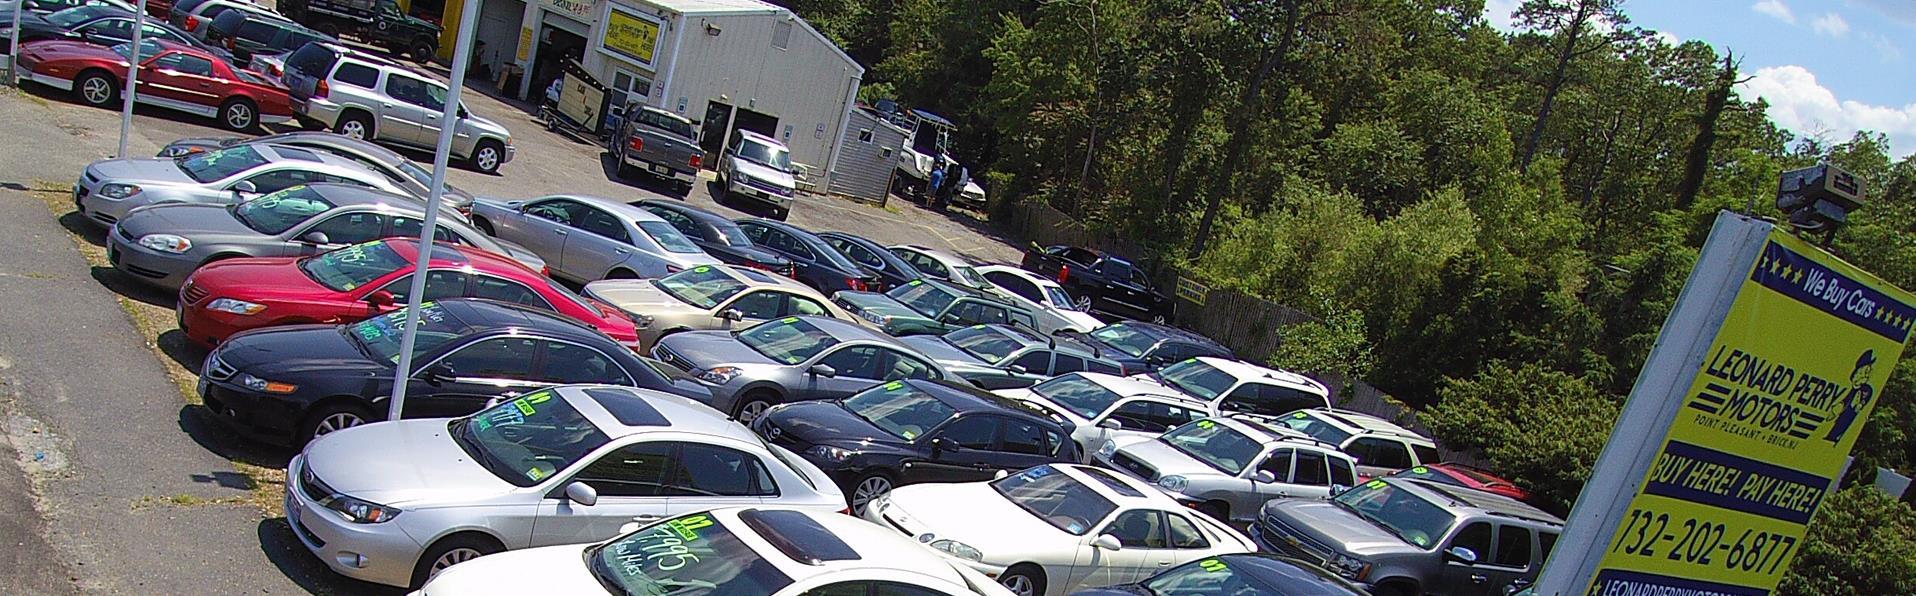 Ford Dealers Nj >> Leonard Perry Motors - impremedia.net